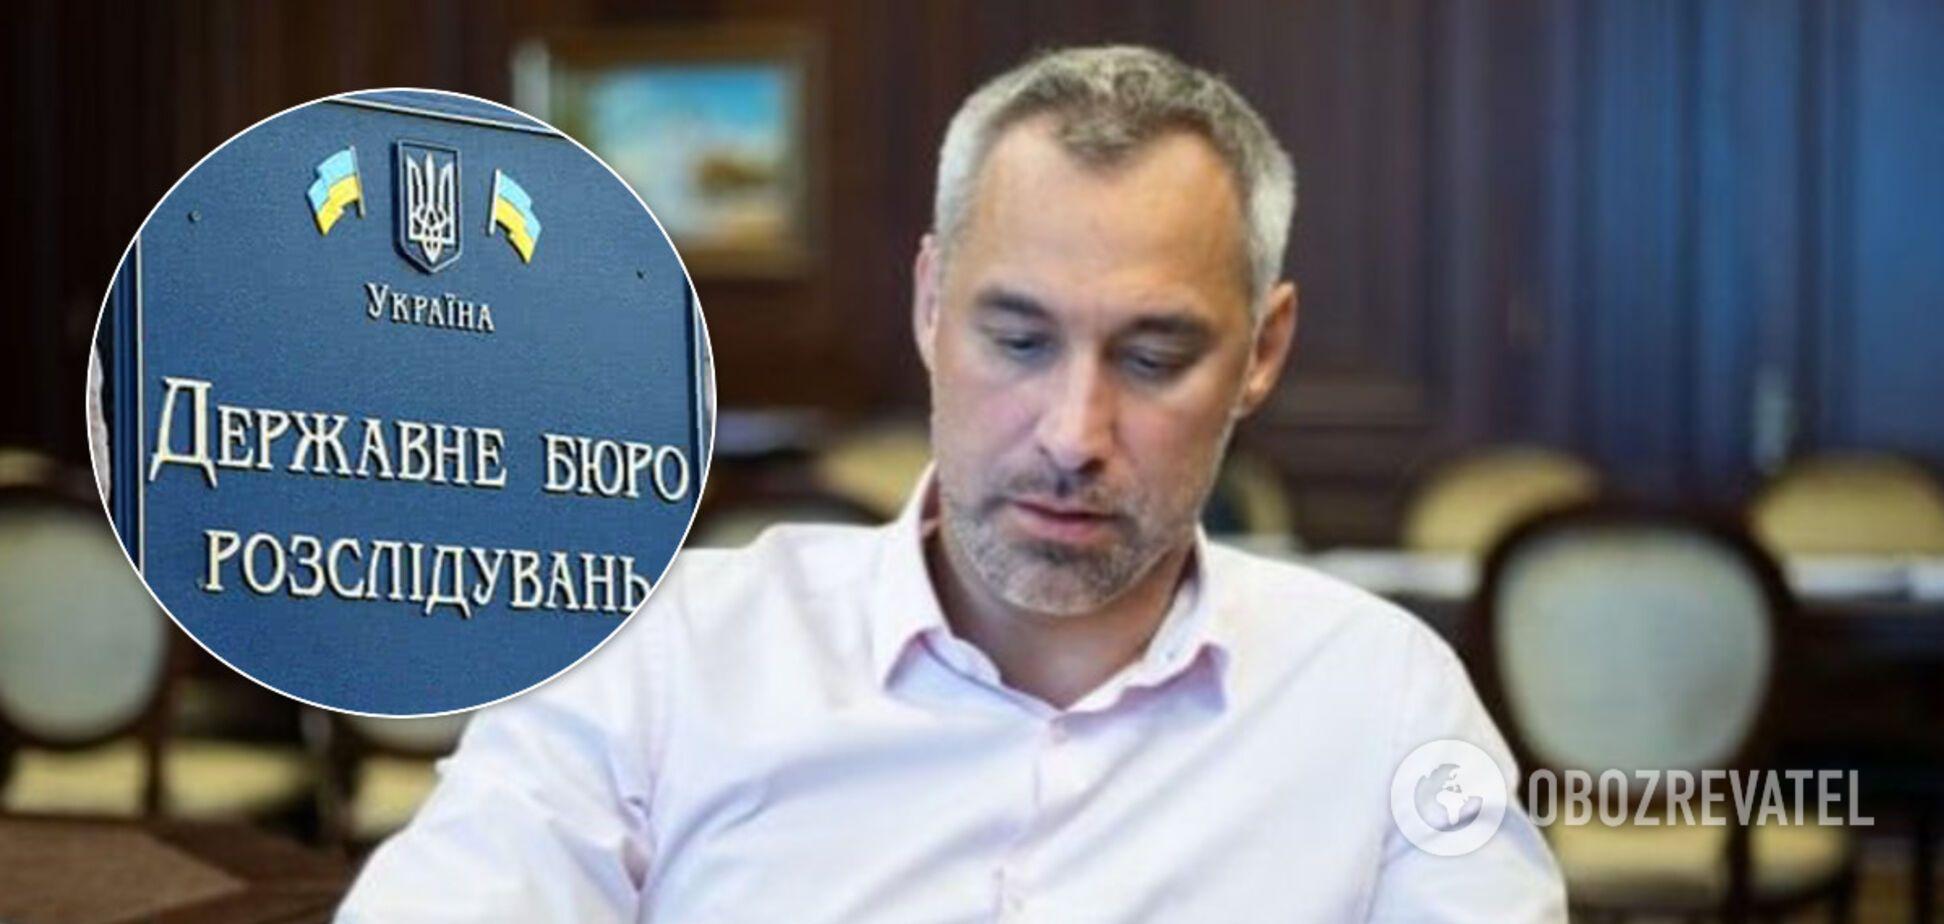 Рябошапка пояснив, чому справи проти Порошенка безперспективні